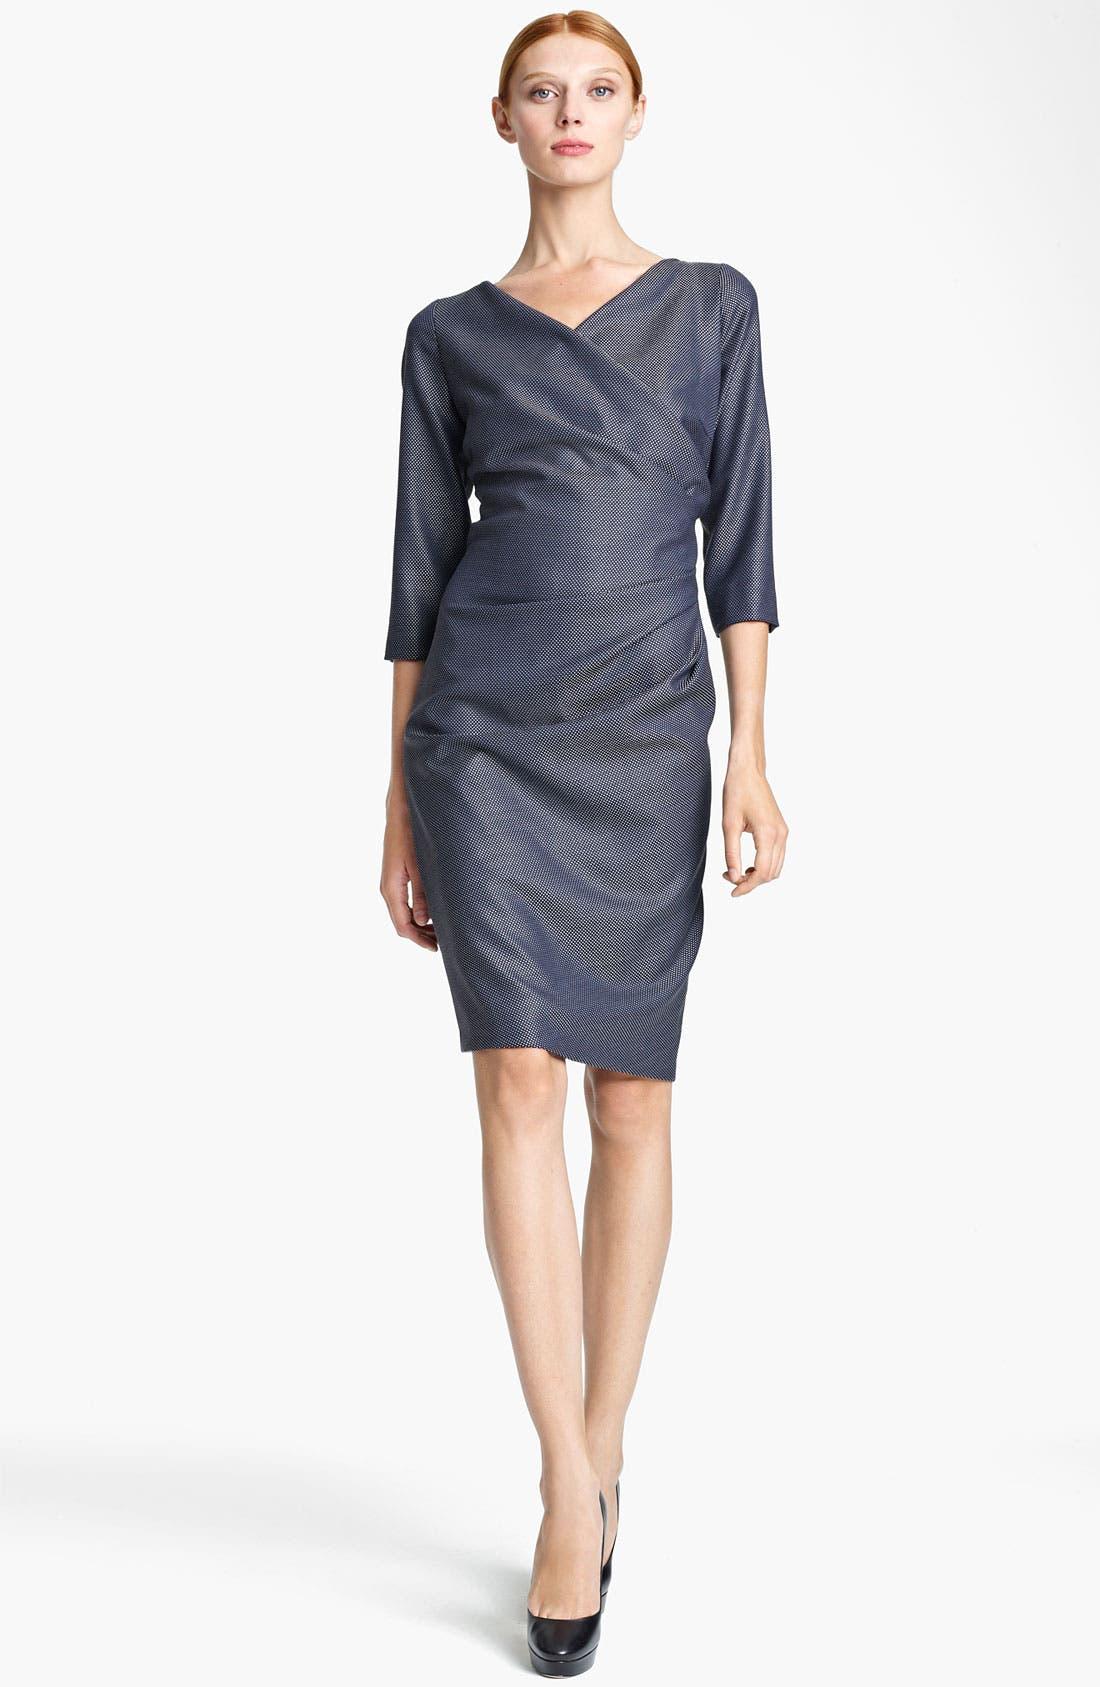 Main Image - Max Mara 'Acino' Pin Dot Dress